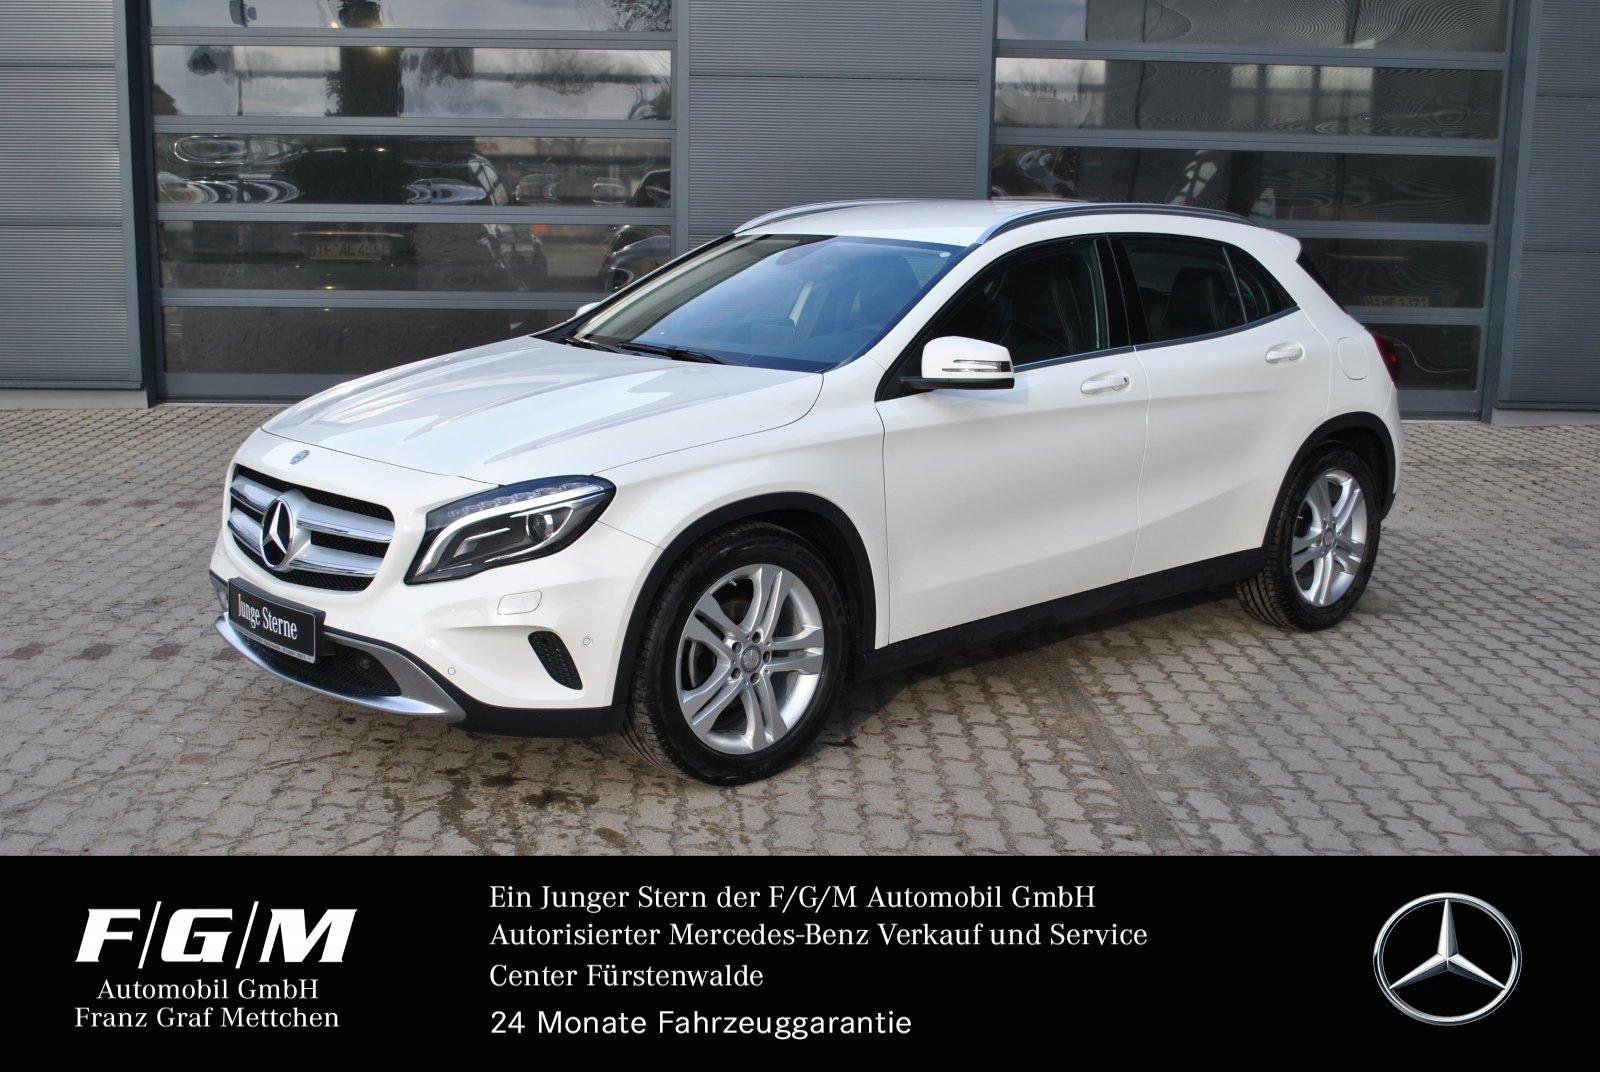 Mercedes-Benz GLA 180 Urban/Navi/Bi-Xenon/Parktronic/7G DCT, Jahr 2016, Benzin